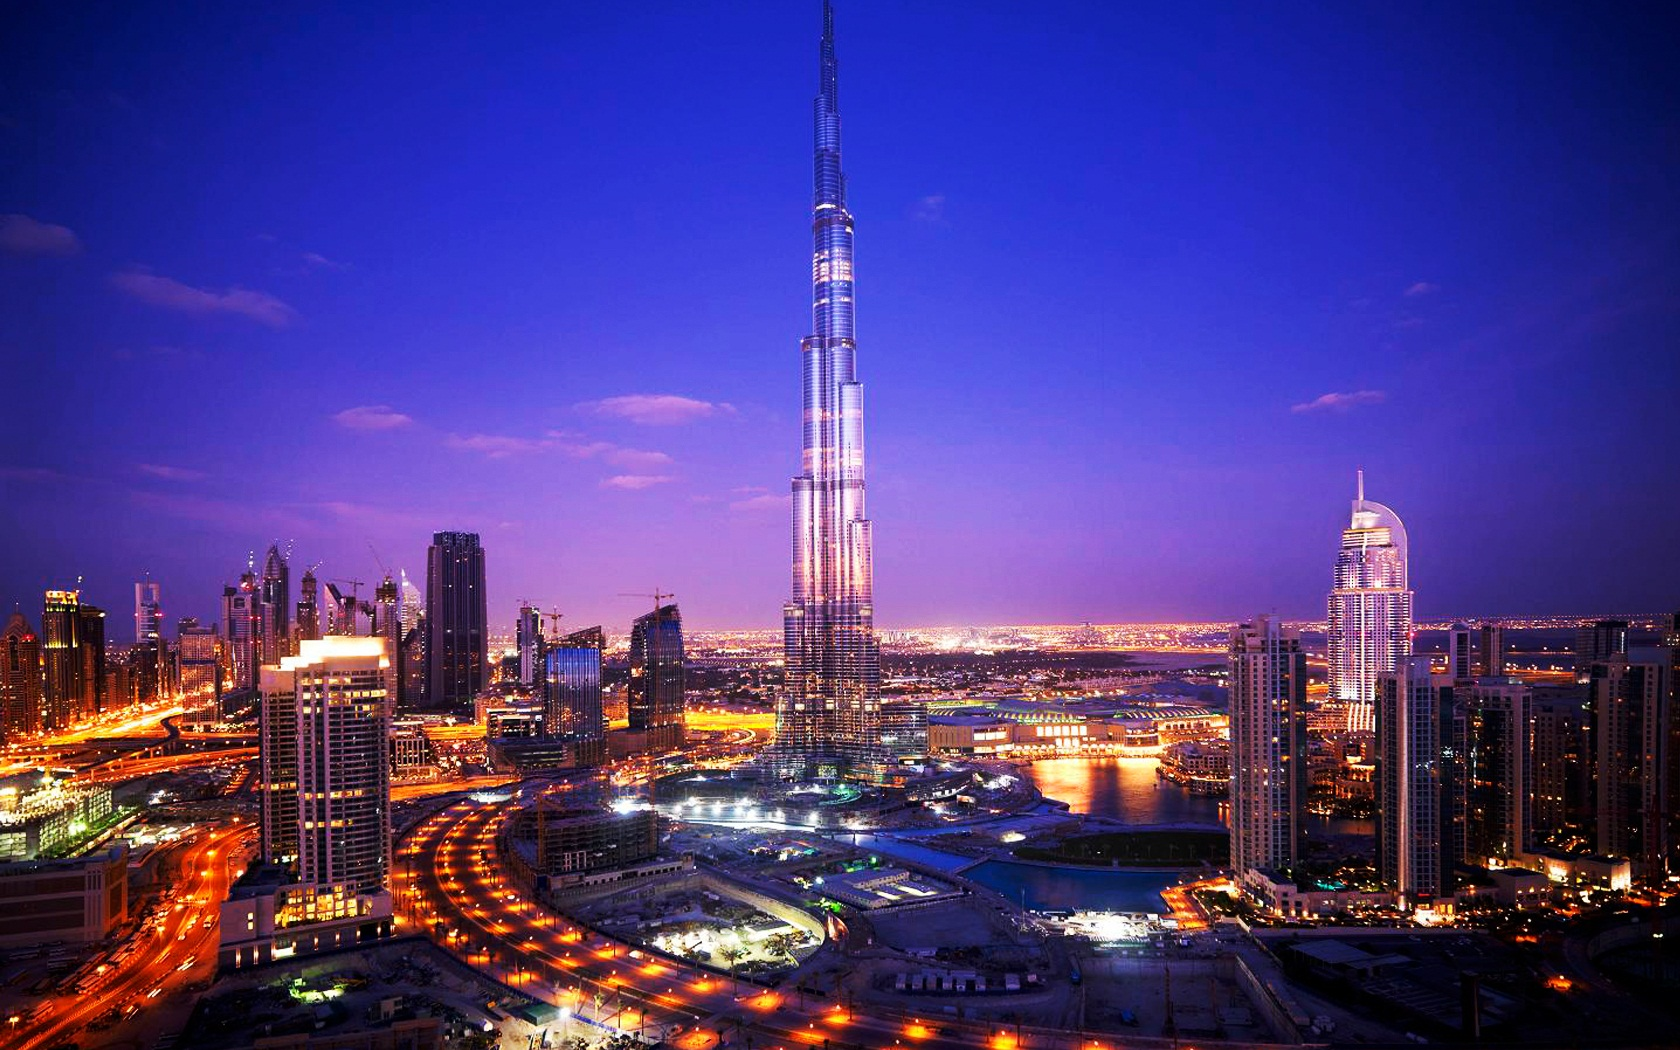 Burj Khalifa Tower Dubai Wallpapers HD Wallpapers 1680x1050